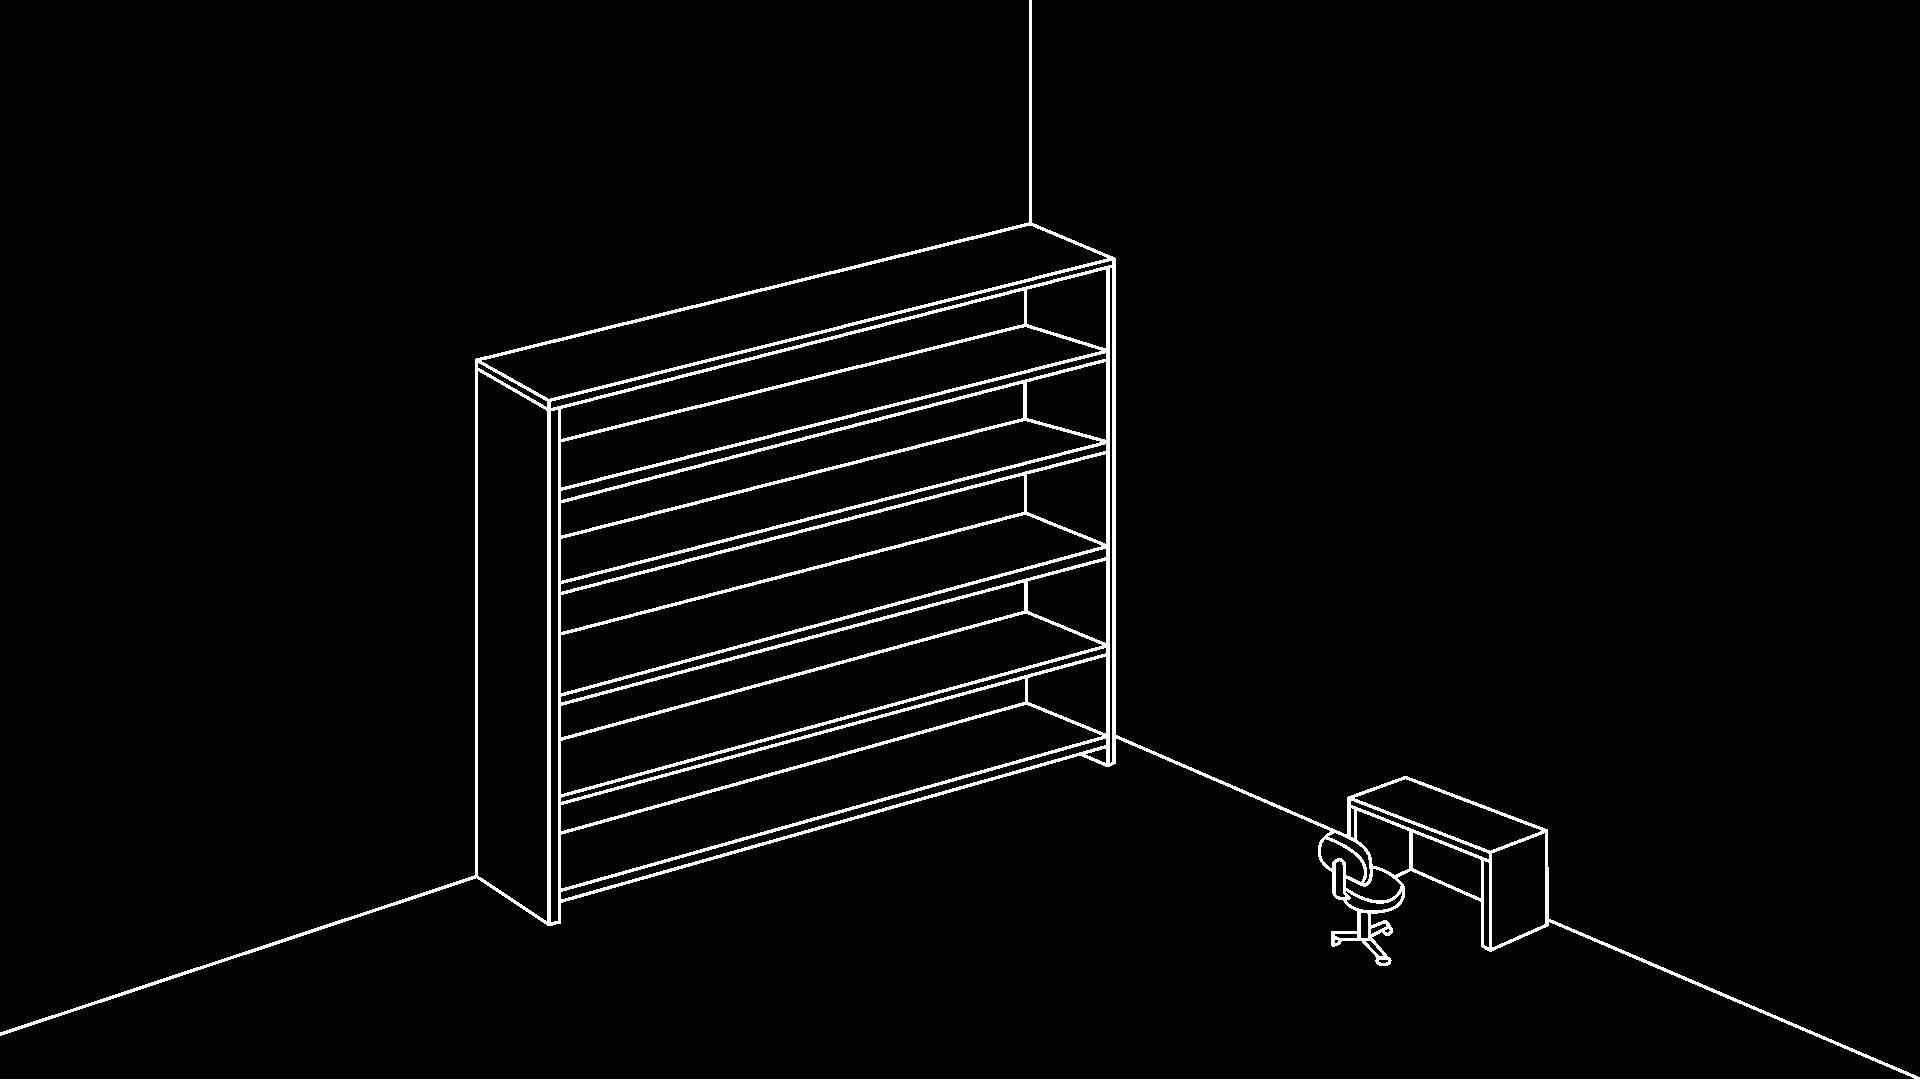 1920x1080 shelf desktop 617441 shelf desktop background 609389